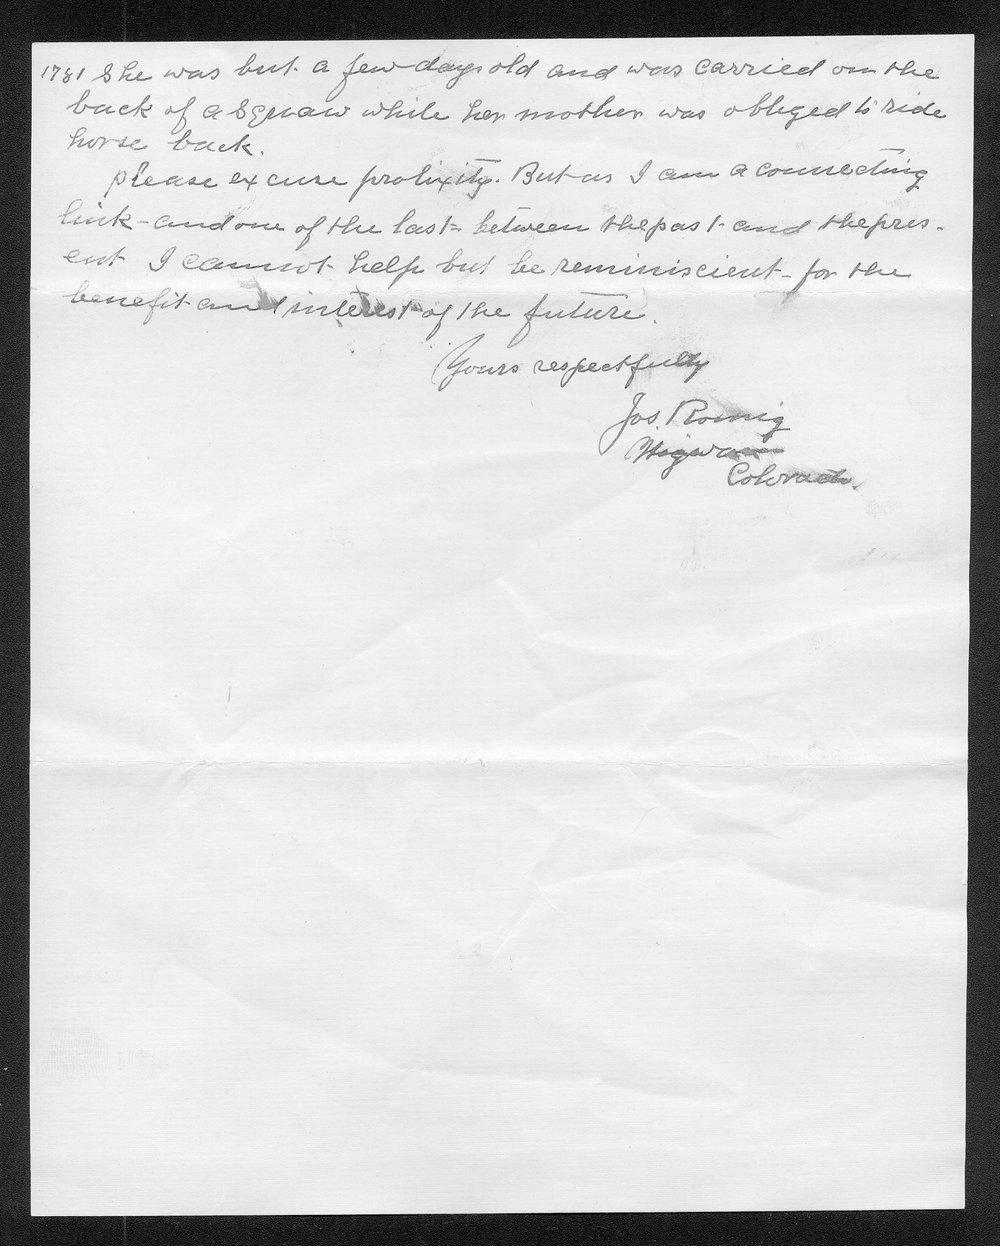 Joseph Romig to George W. Martin - 5